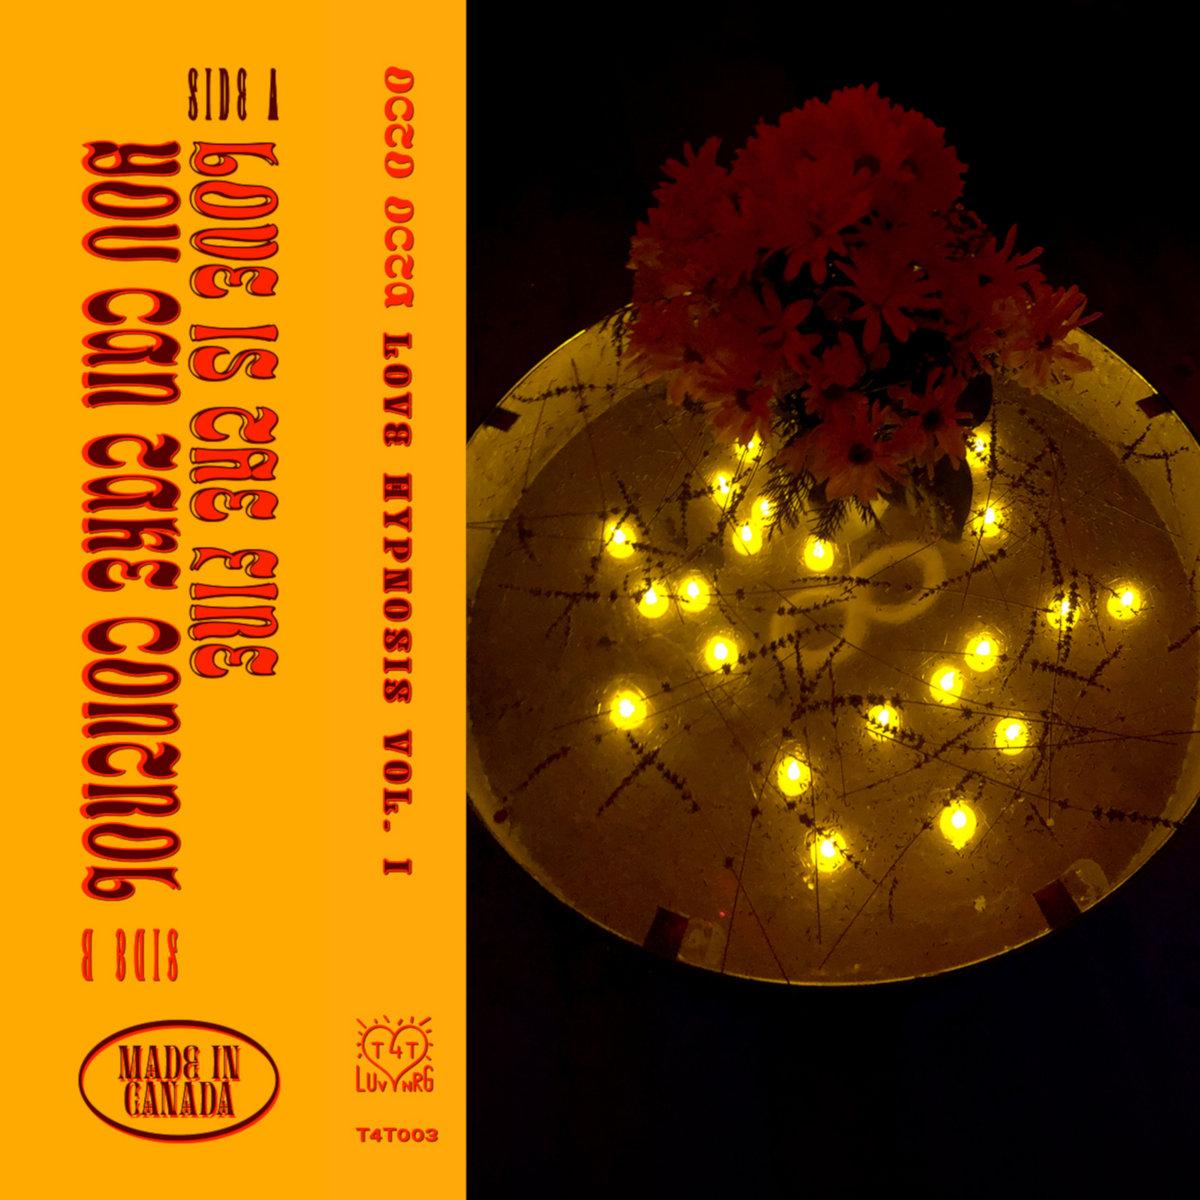 Octo Octa - LOVE HYPNOSIS (T4T003)